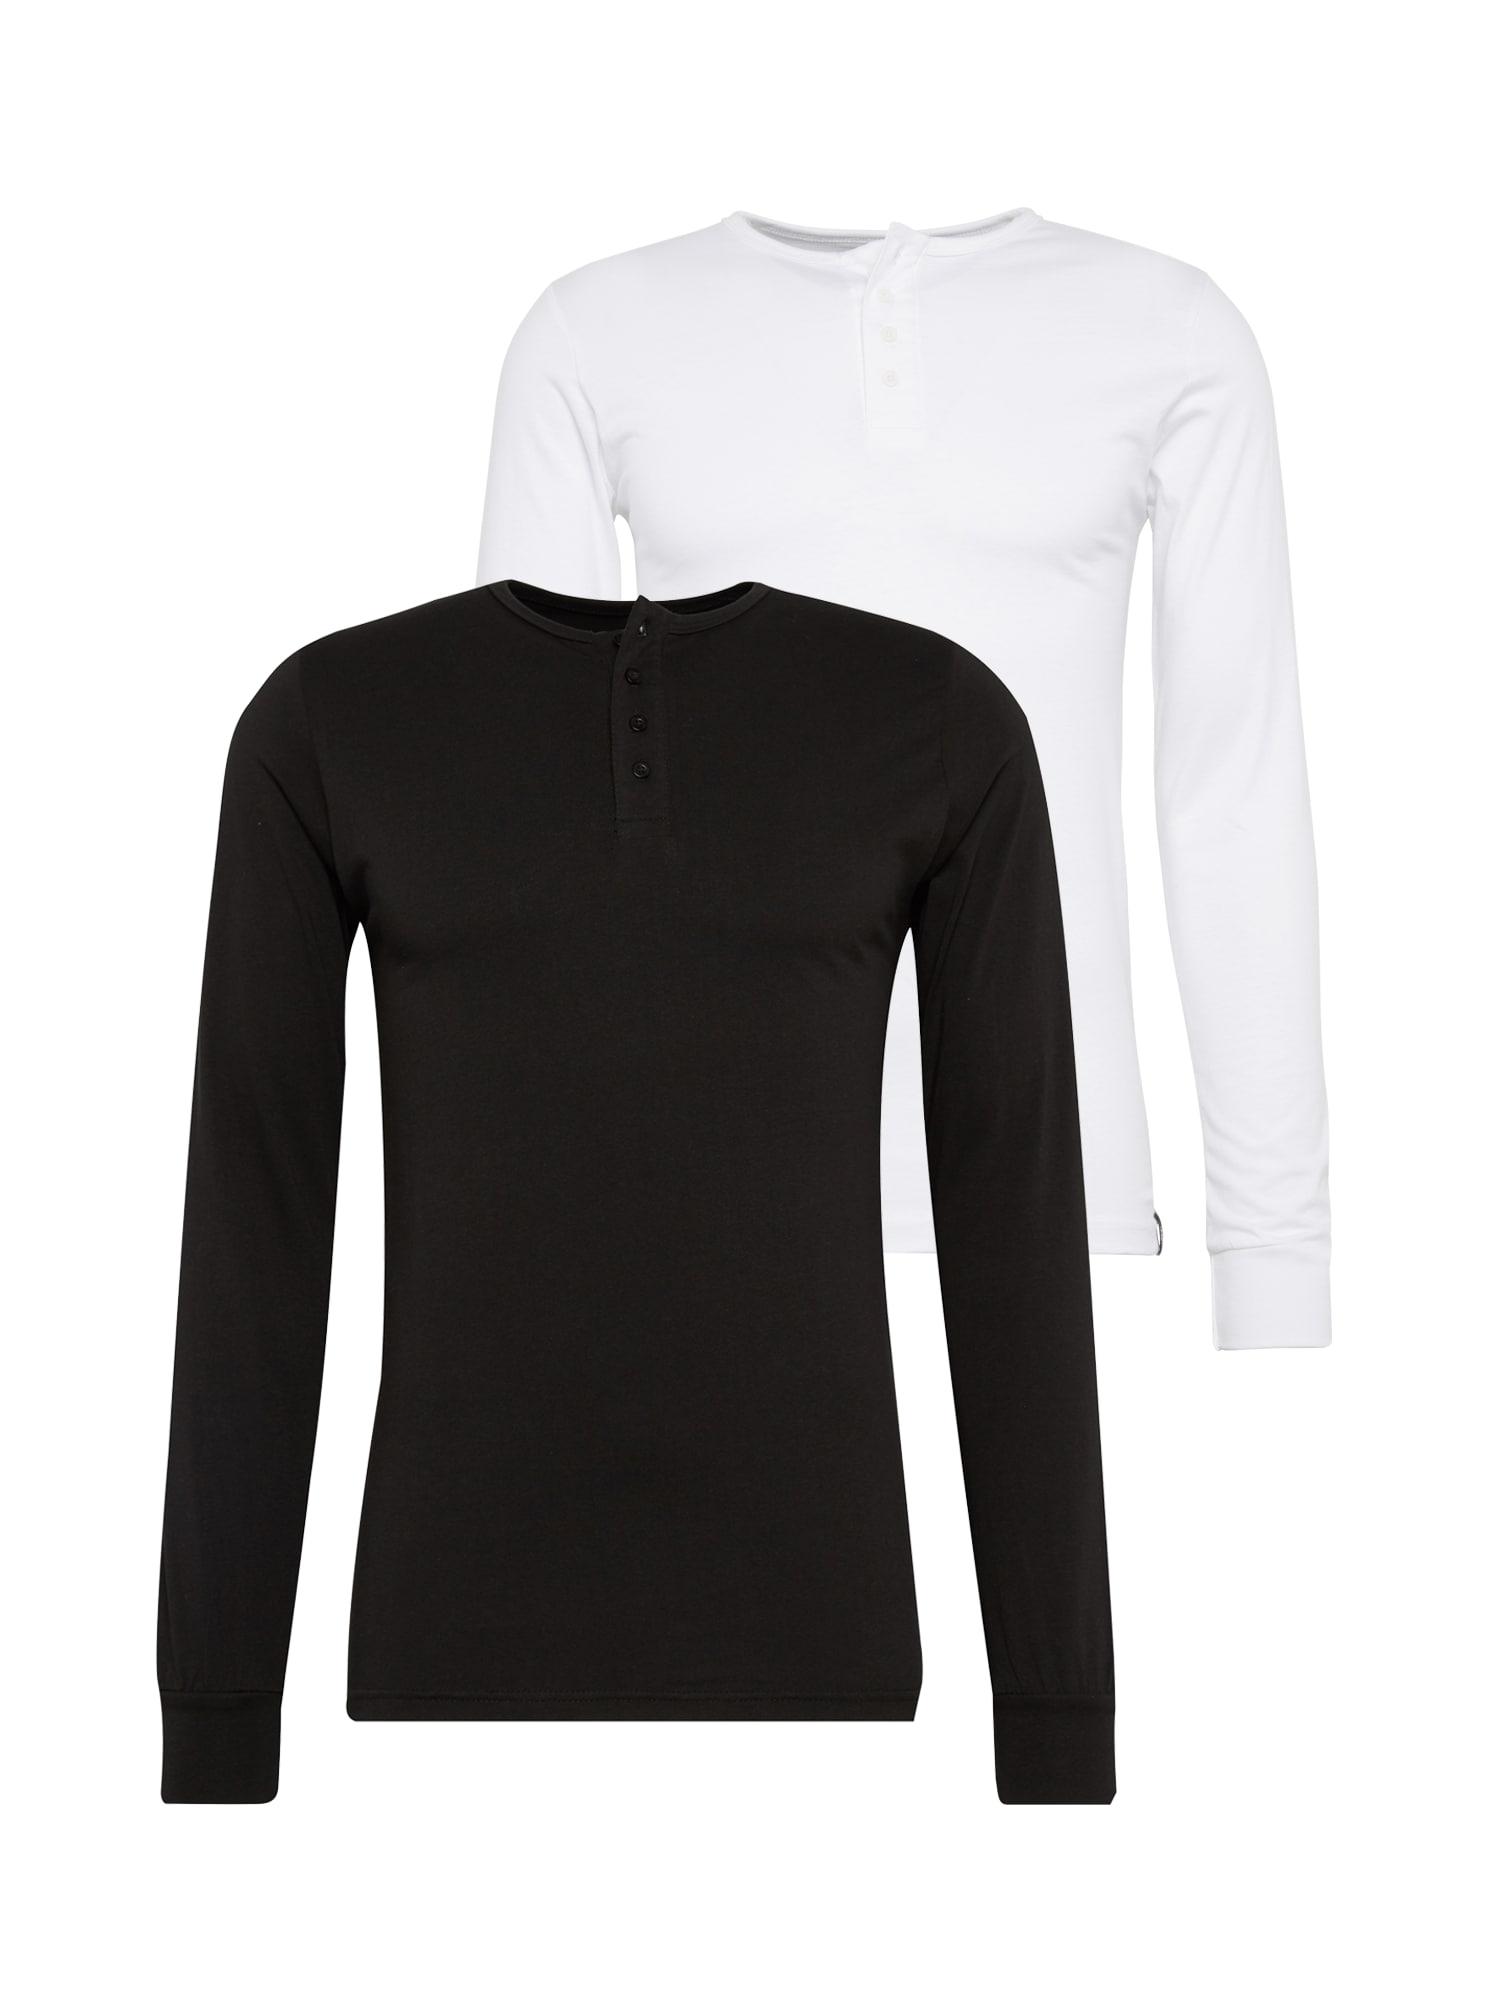 Tričko Seibert černá bílá DICKIES